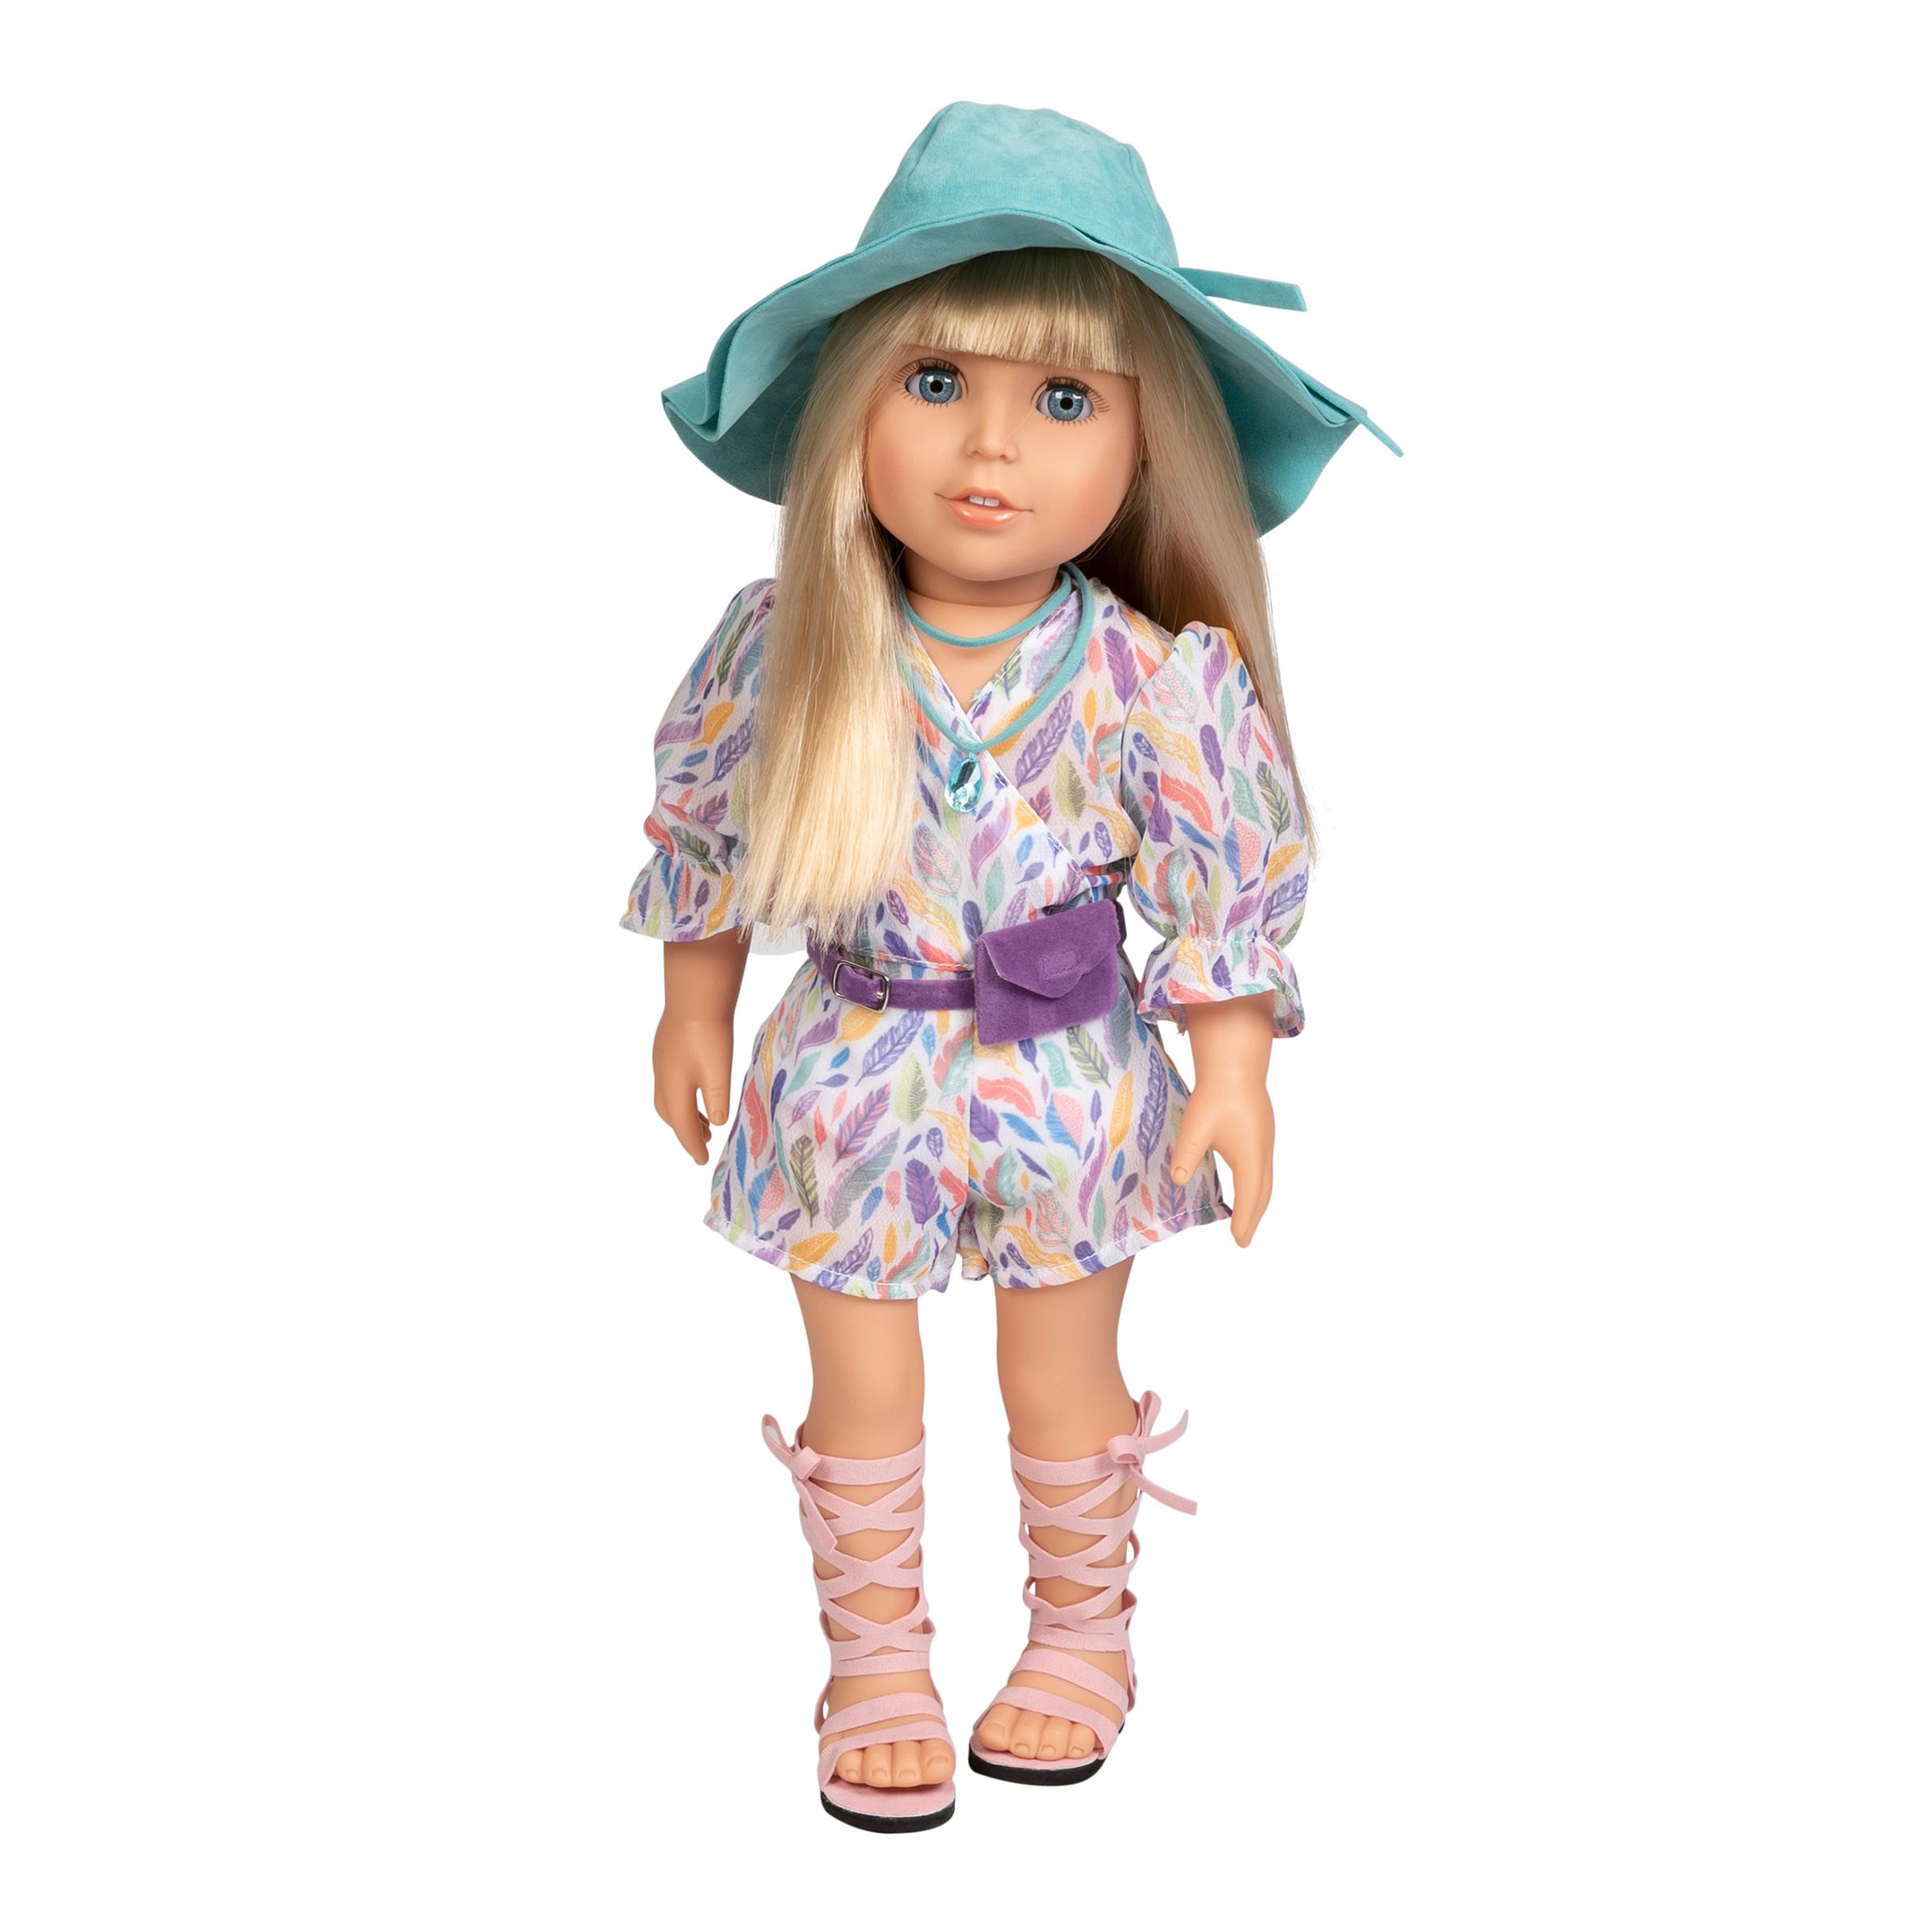 Adora Amazing Girls 18-inch Doll Claire